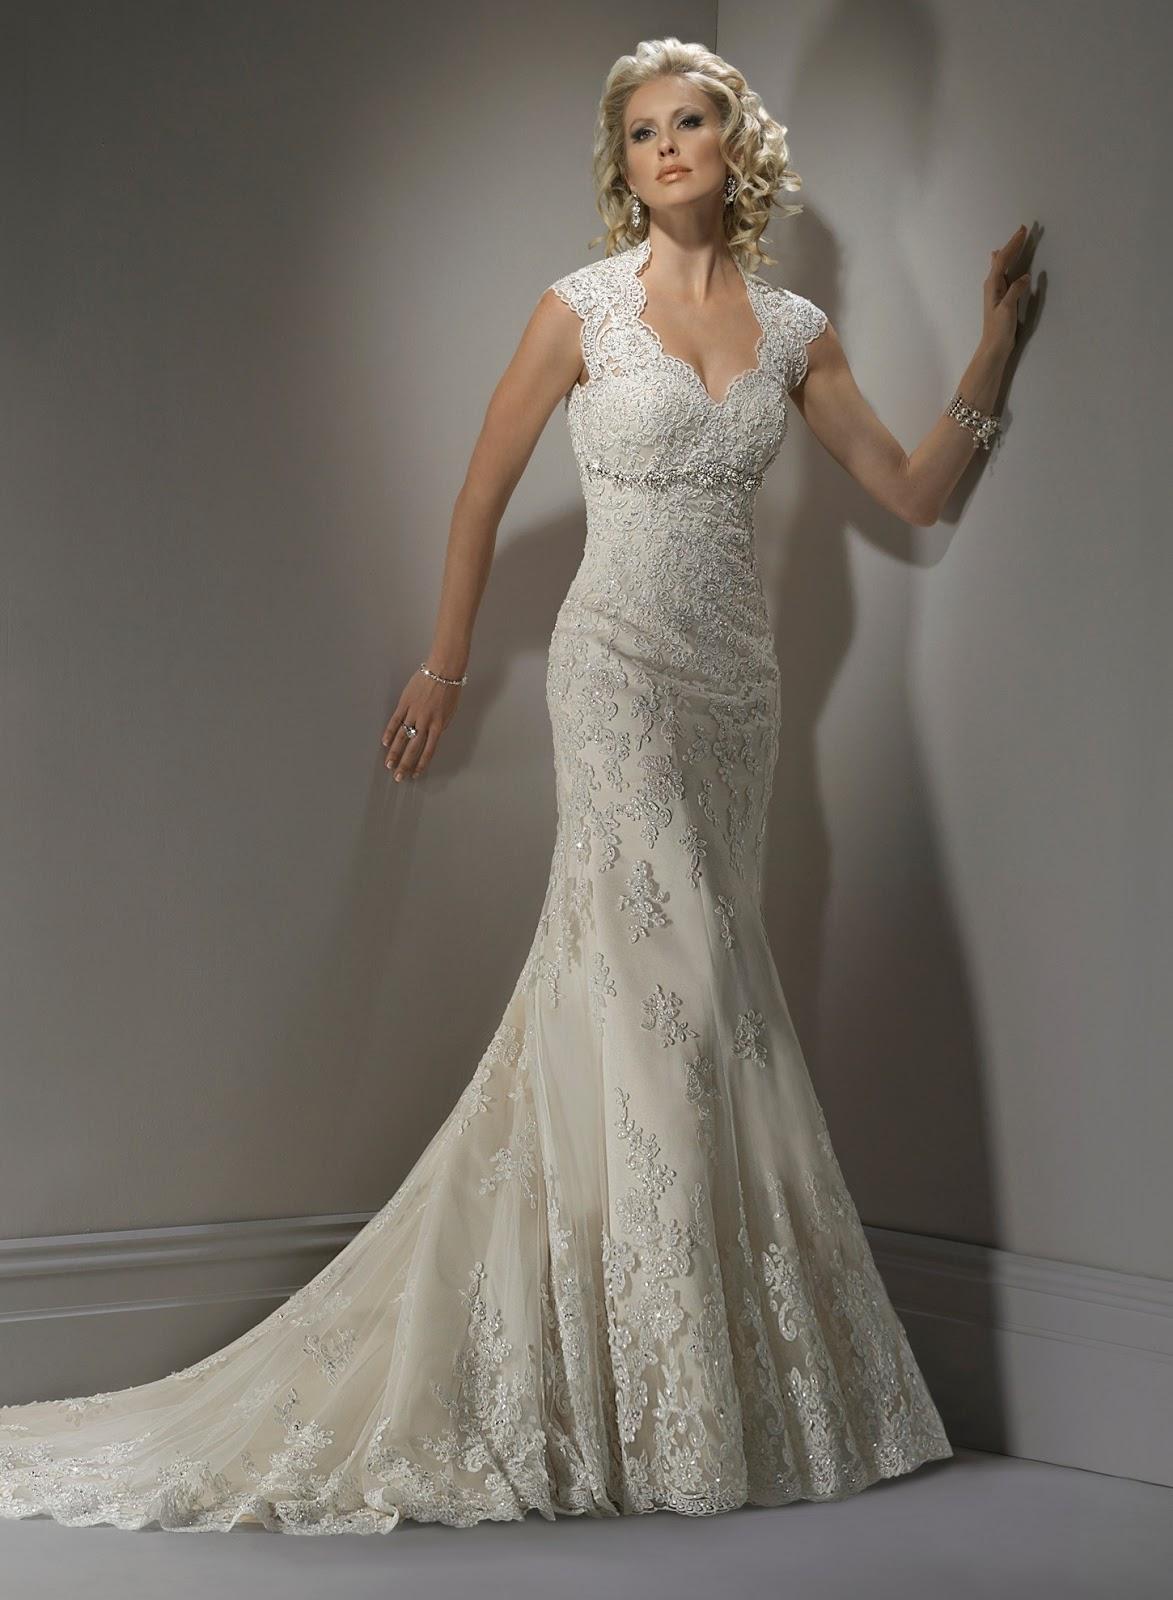 902a5cd33a Wedding Dresses For Older Brides Second Weddings Uk